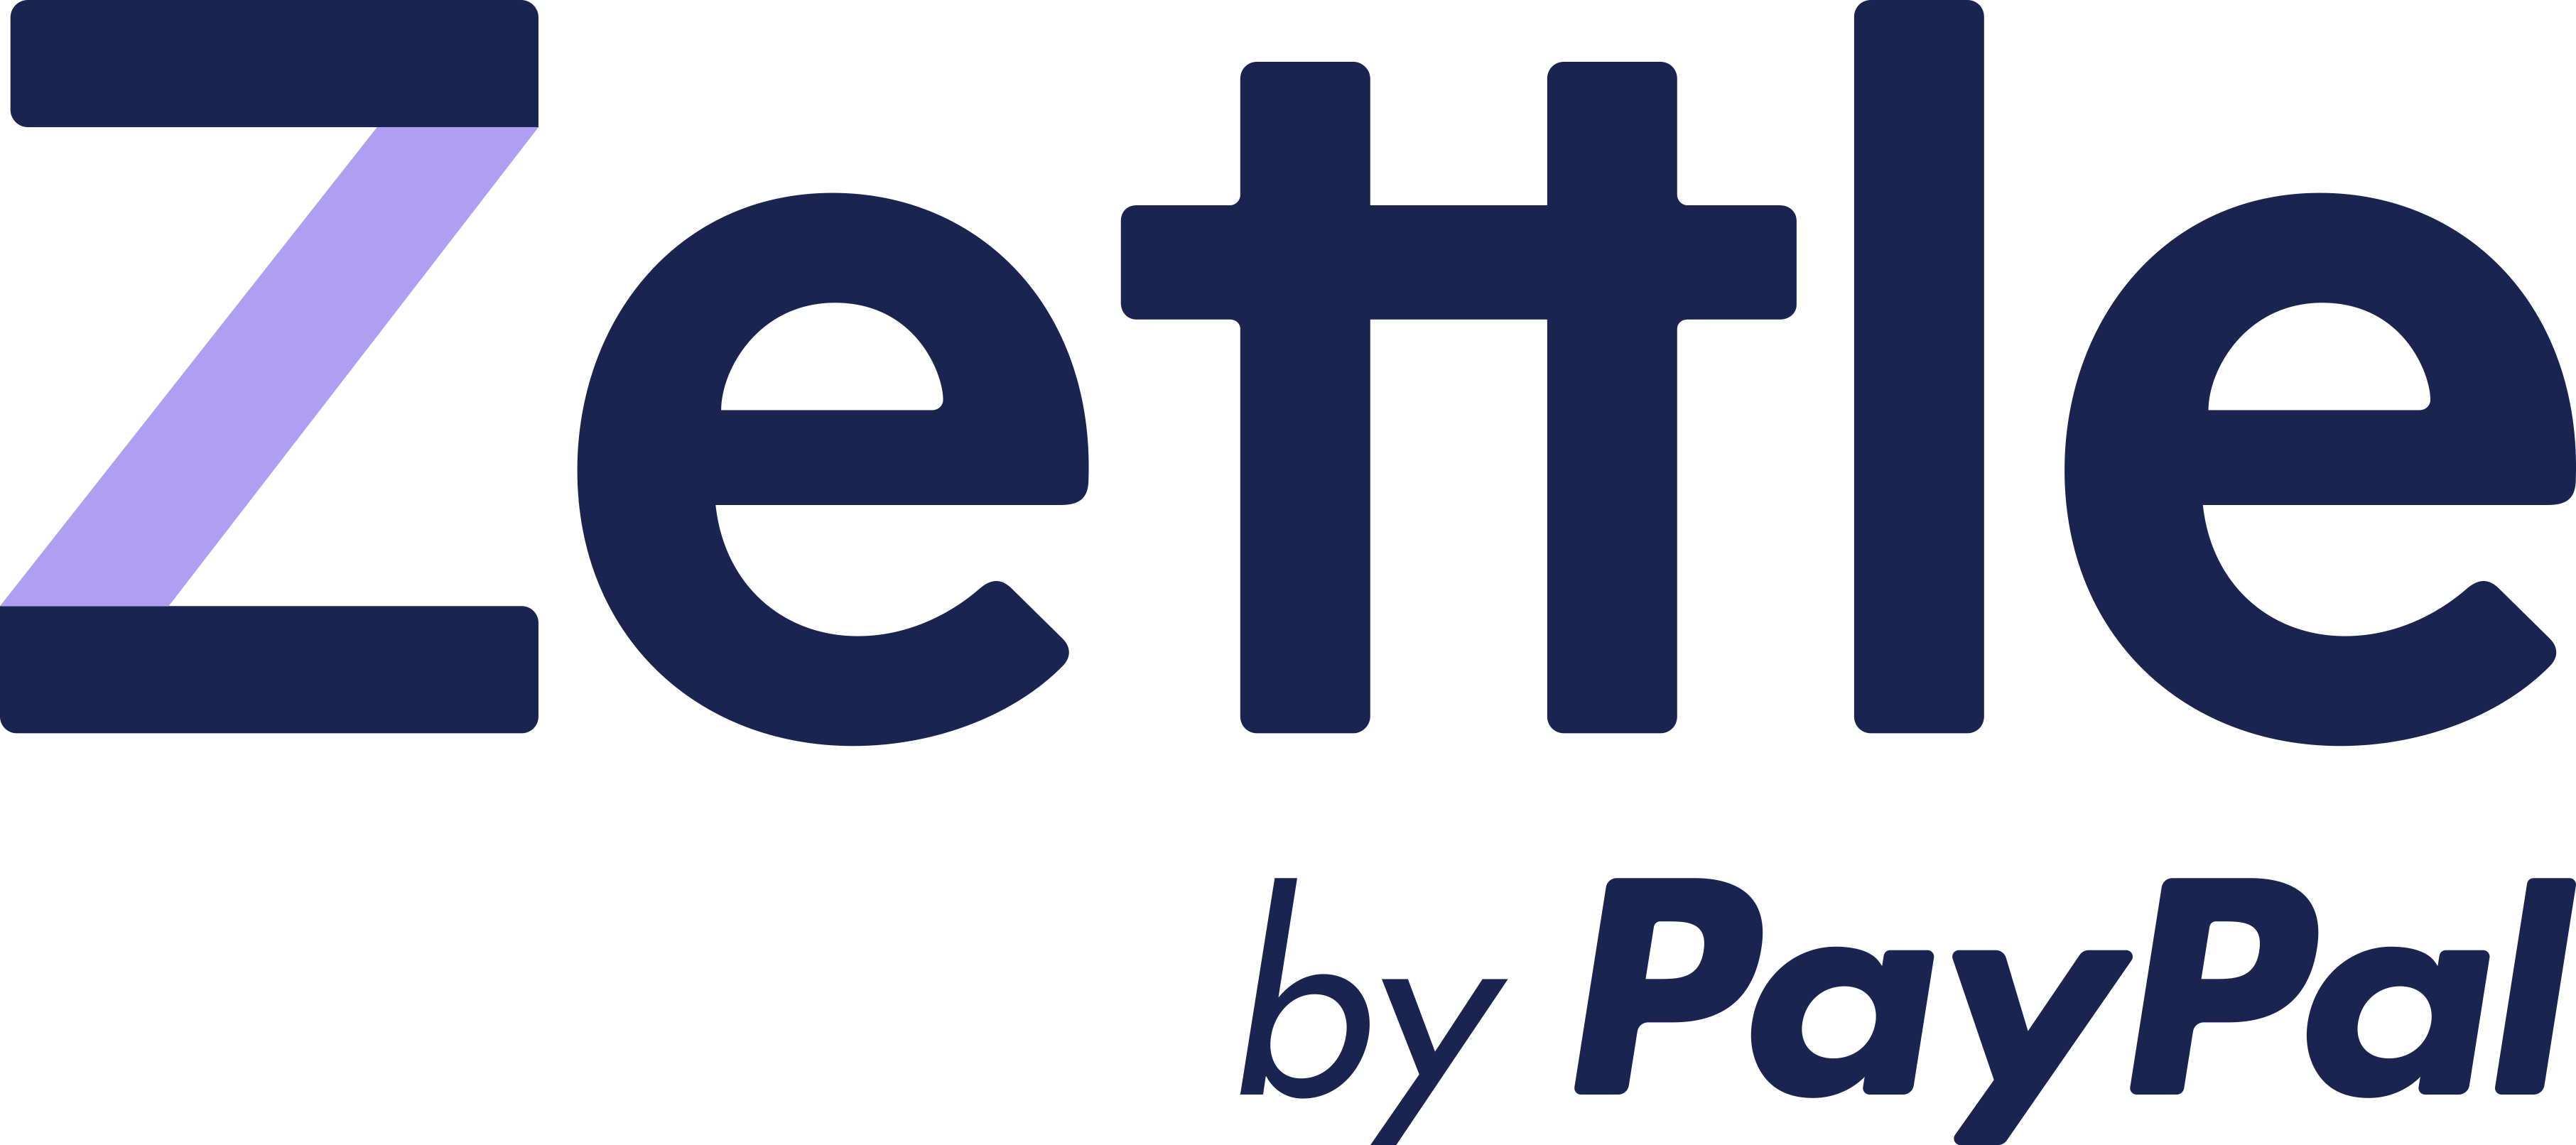 Zettle by PayPal logo